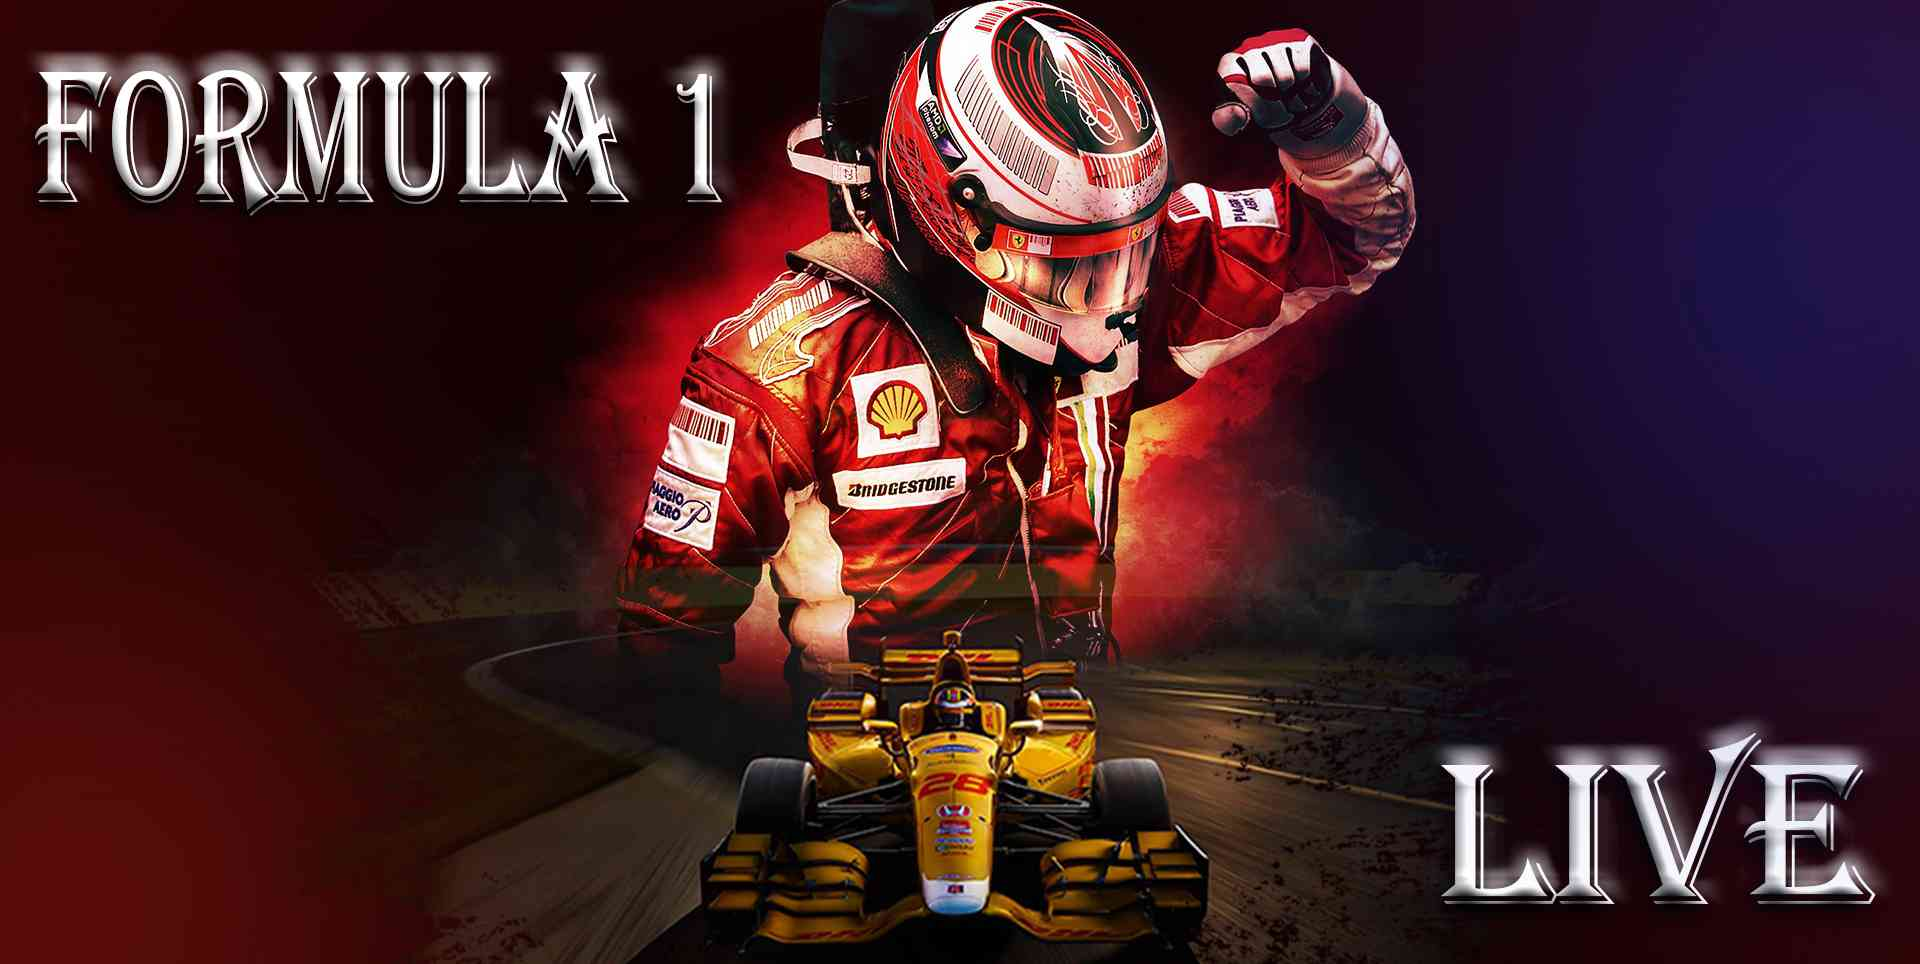 Watch London ePrix Race 1 Live